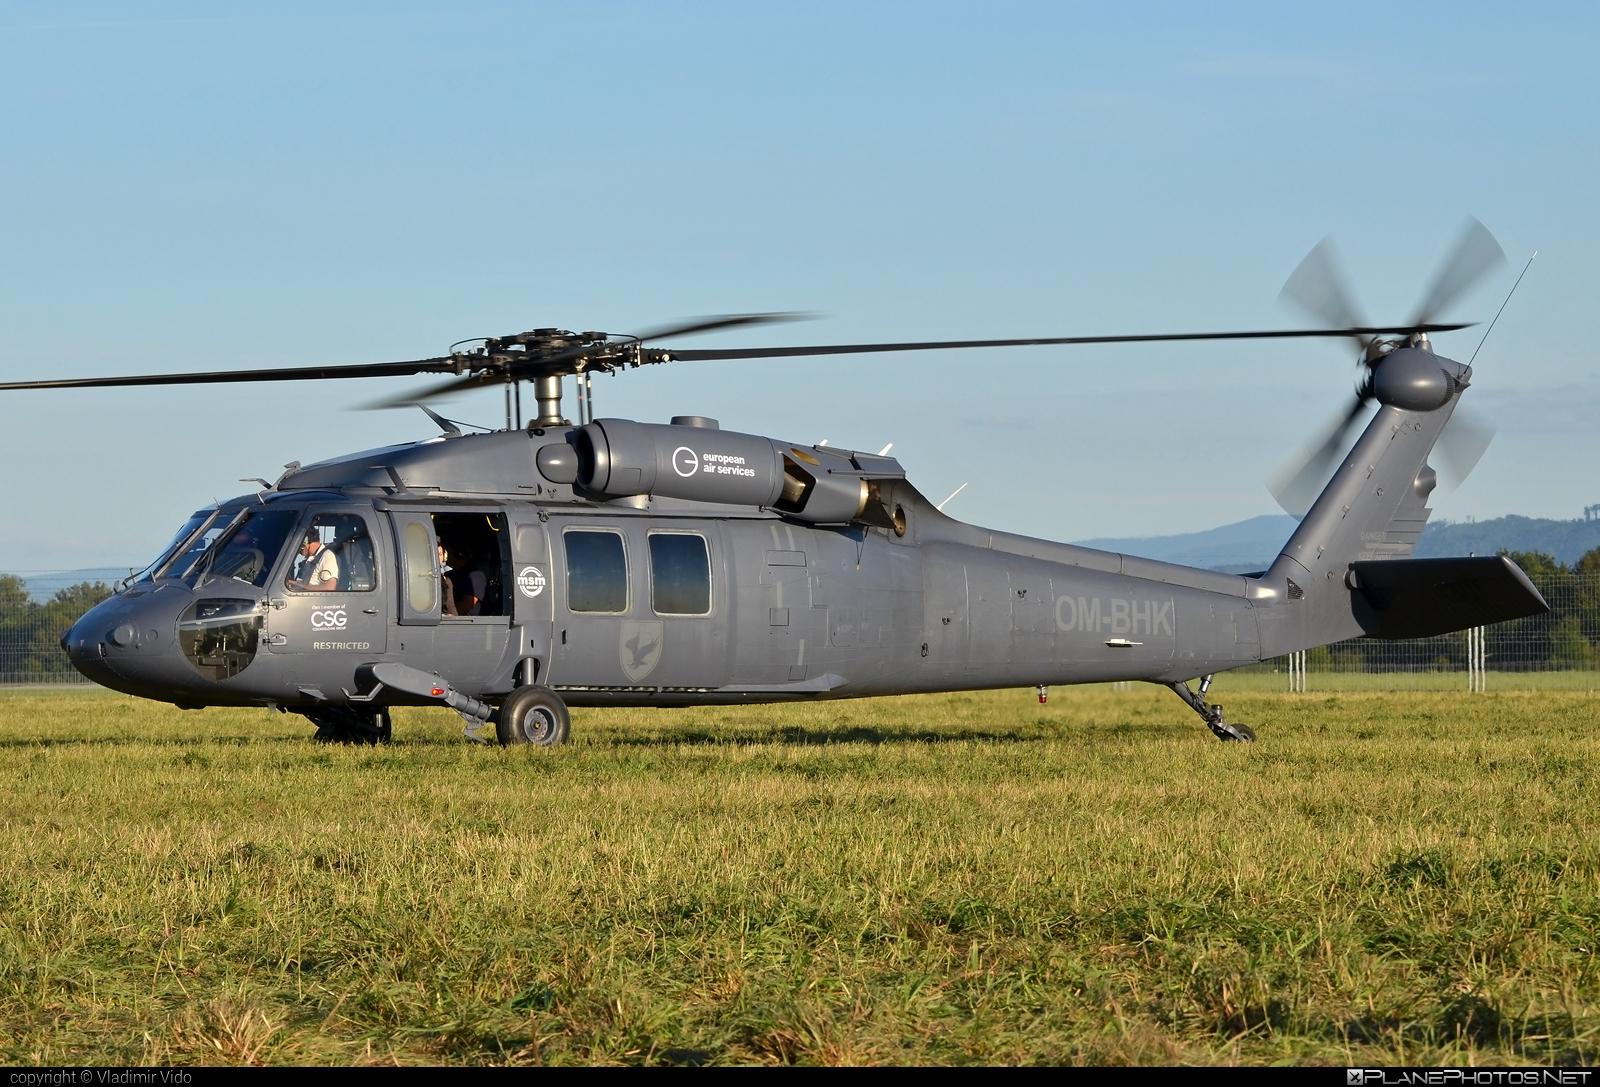 Sikorsky UH-60A Black Hawk - OM-BHK operated by Slovak Training Academy #blackhawk #dnynato2018 #natodays2018 #sikorsky #slovaktrainingacademy #uh60 #uh60a #uh60blackhawk